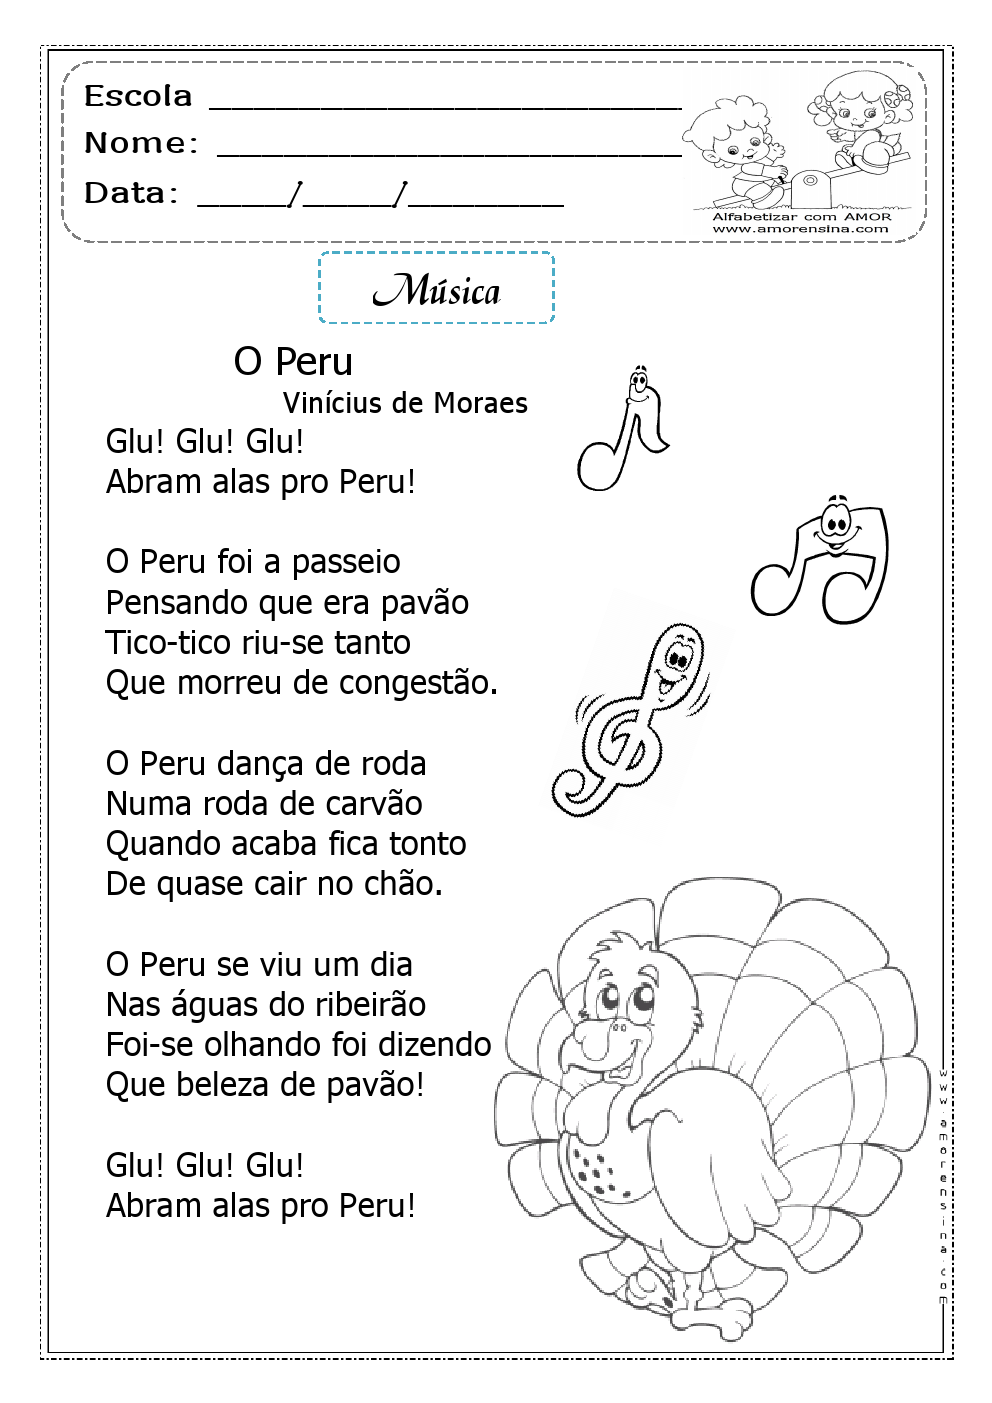 Escola Tiragem Portal Interpretacao E Producao De Textos Poemas